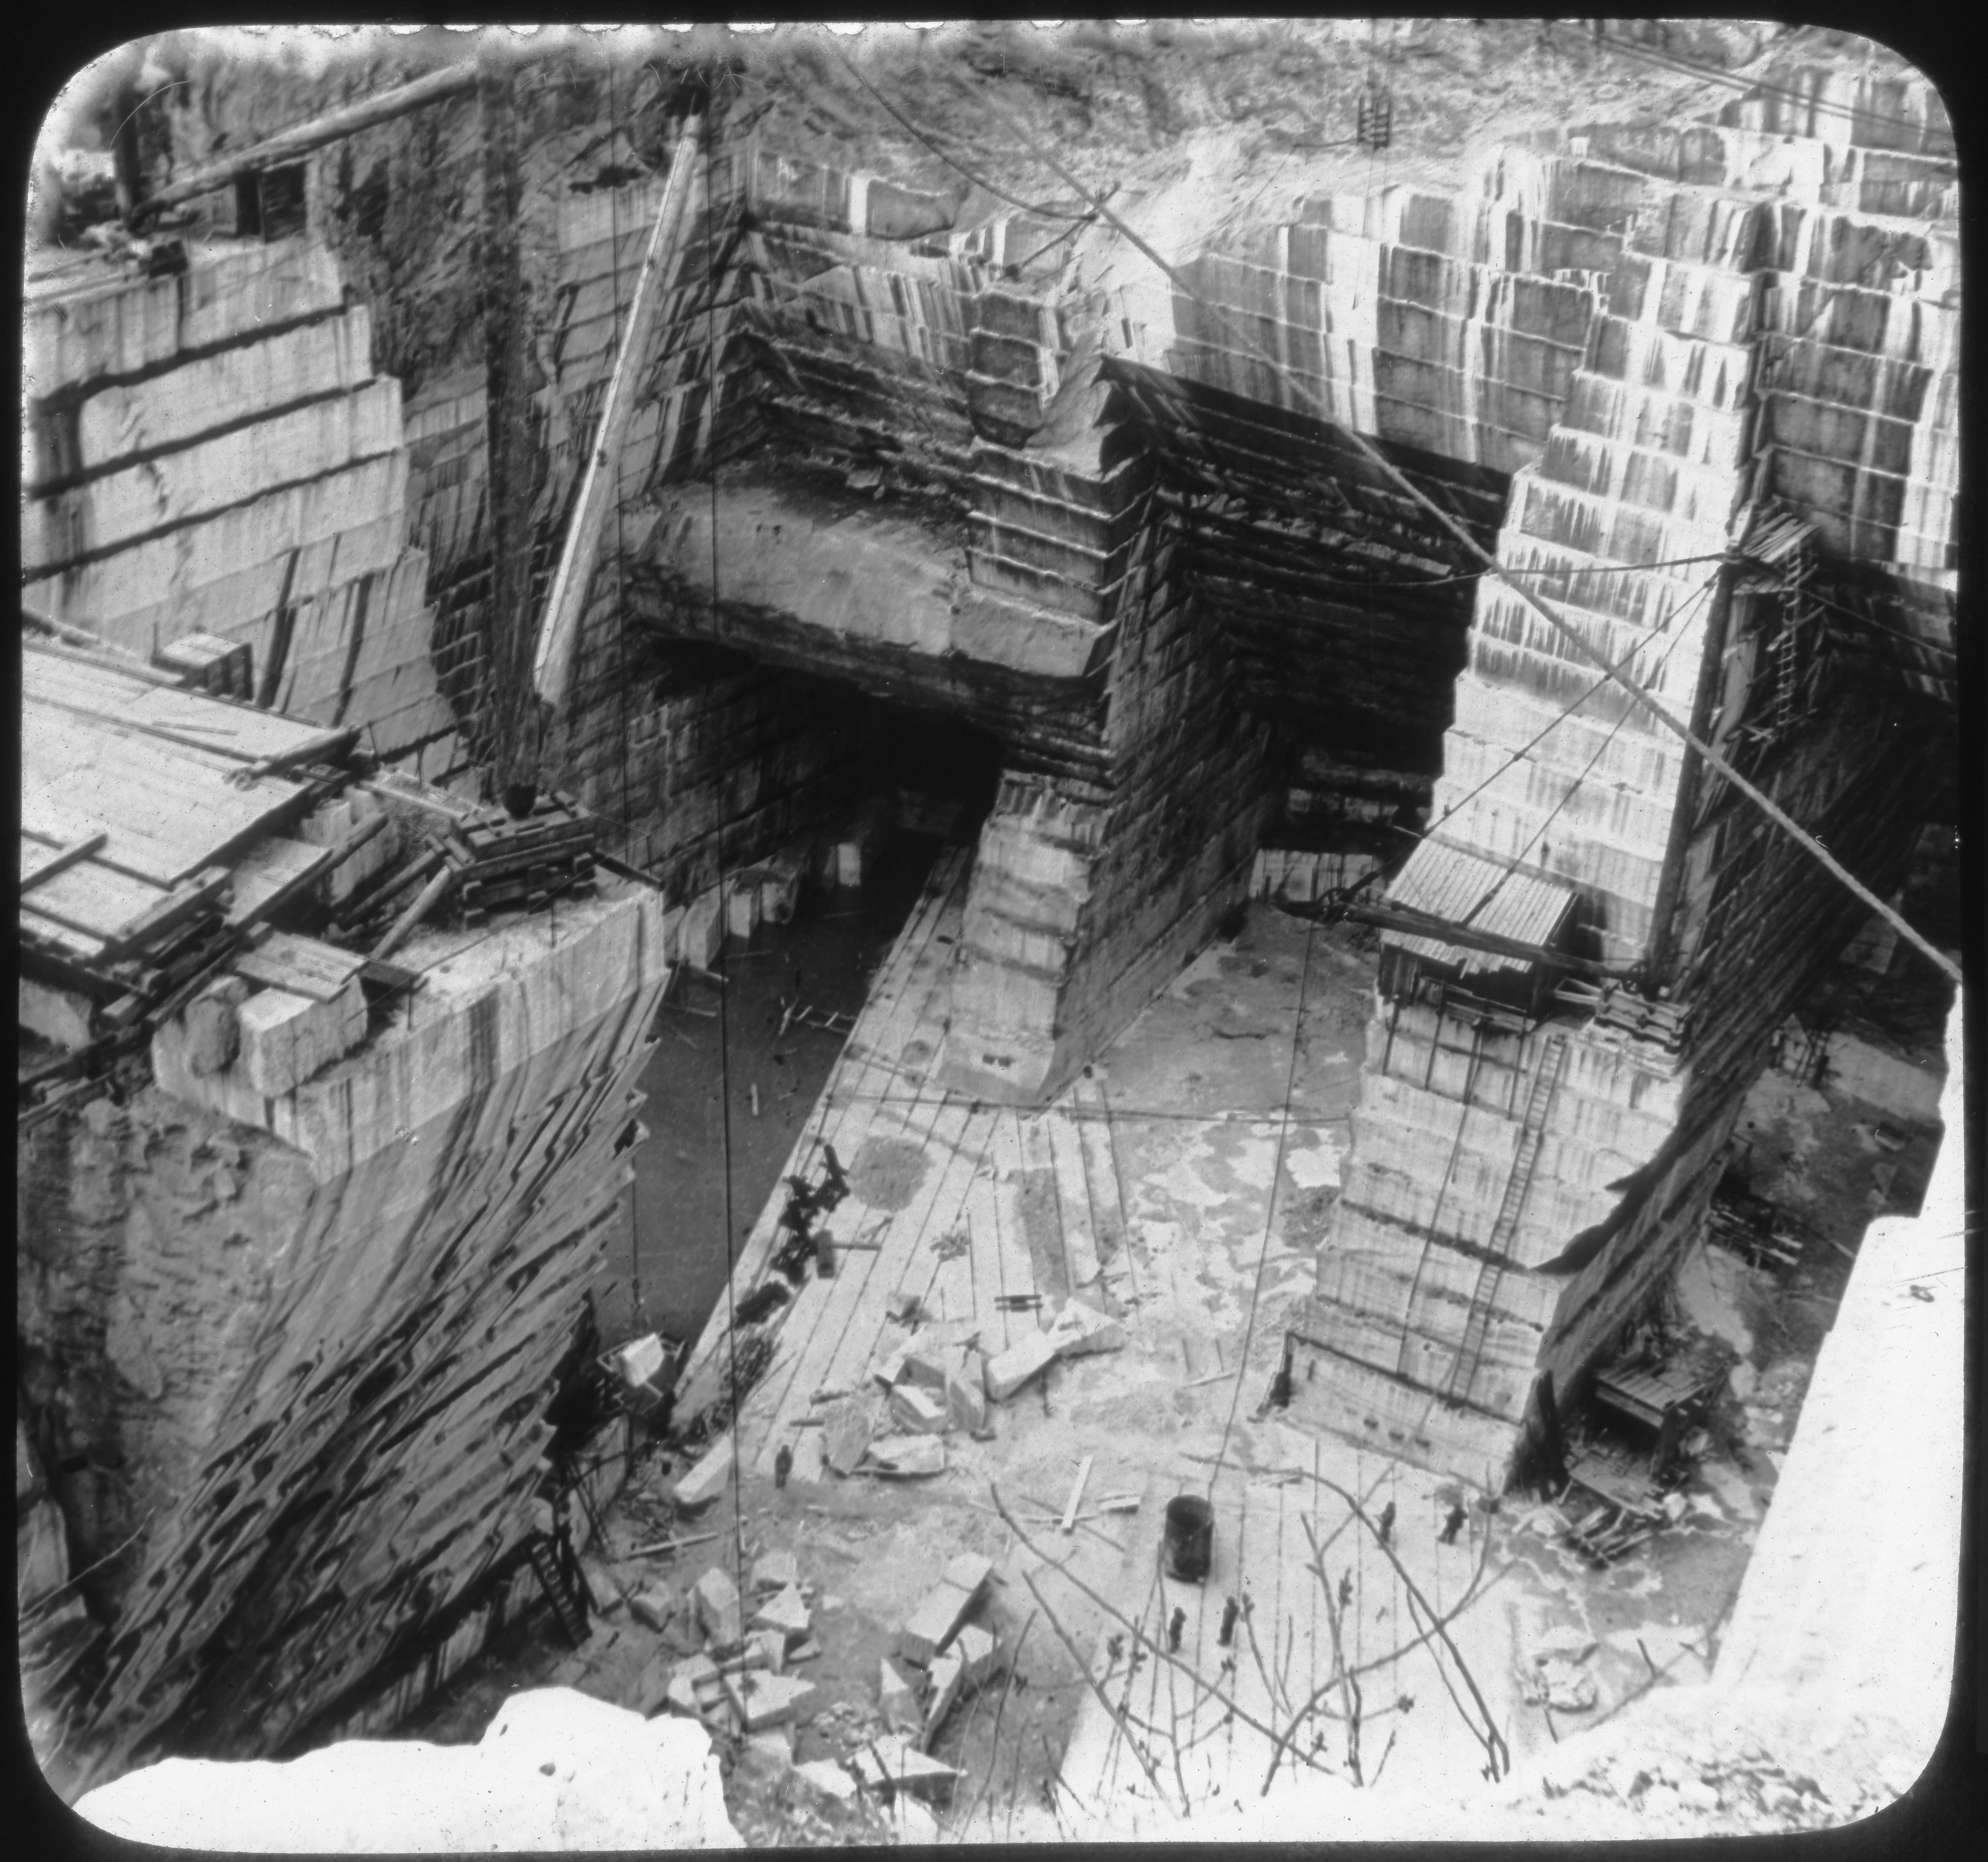 Marble Quarry, Proctor, Vt.